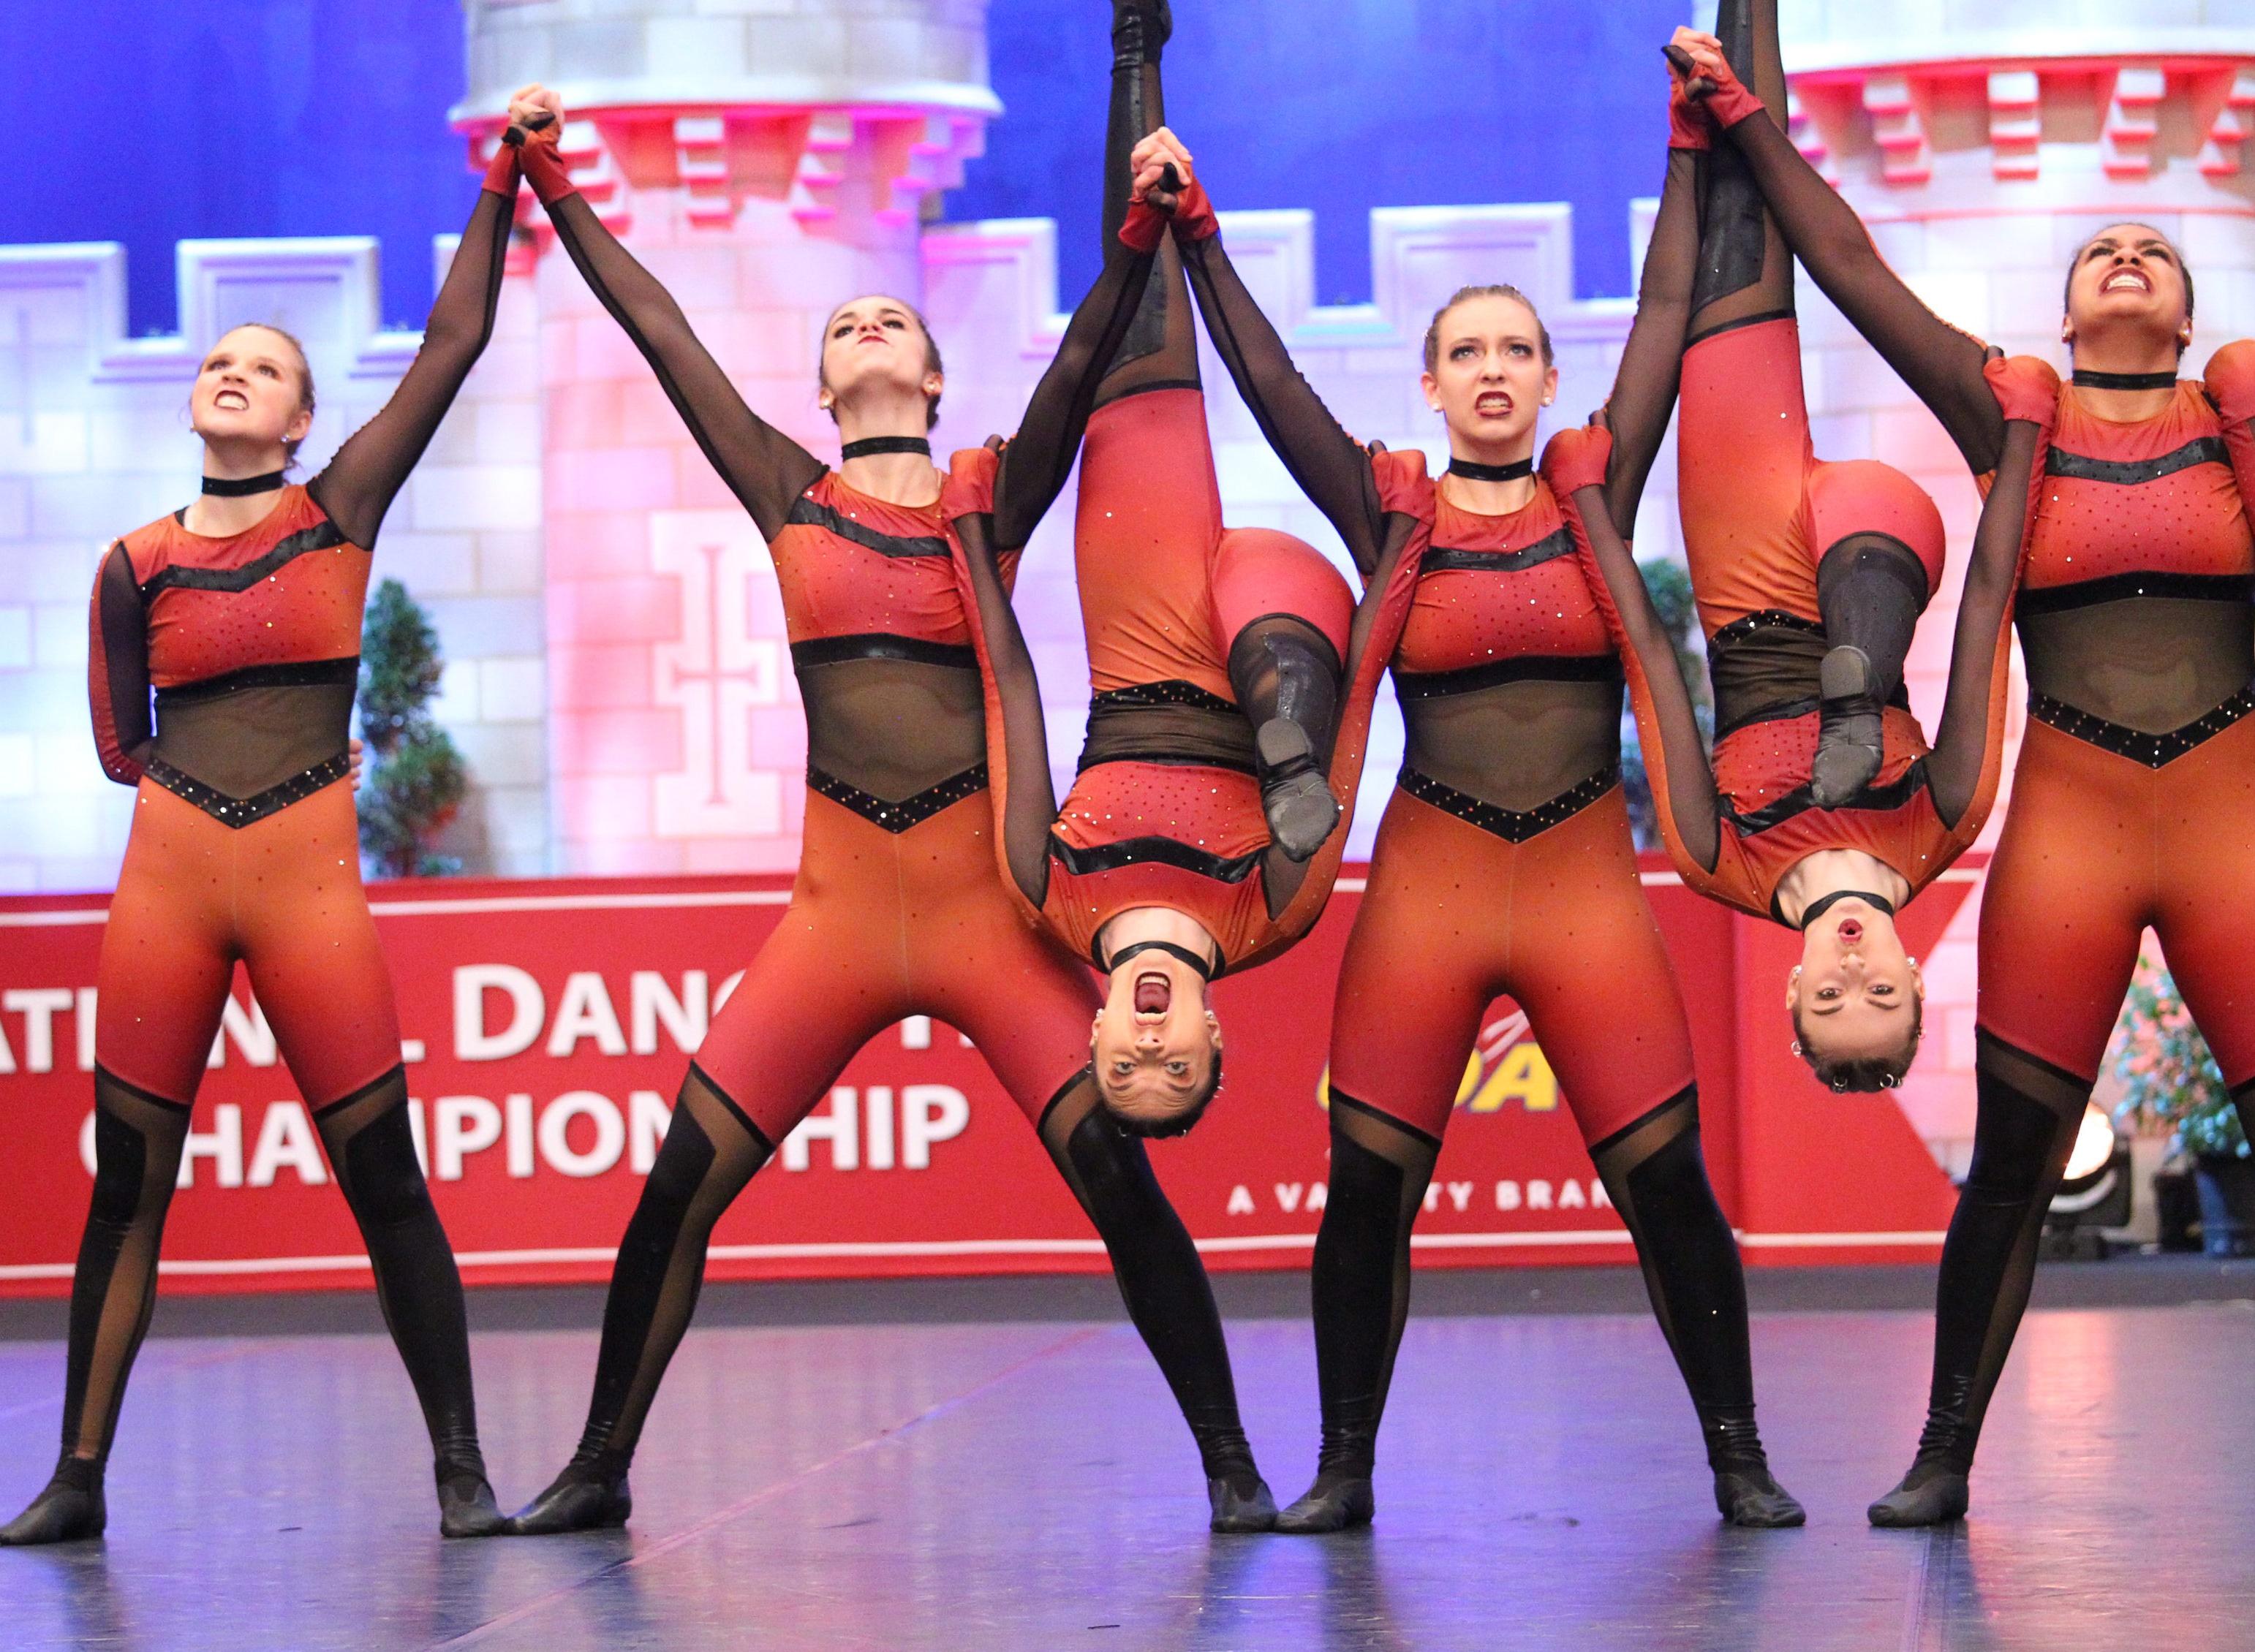 fargo davies dance team custom high kick dance costume